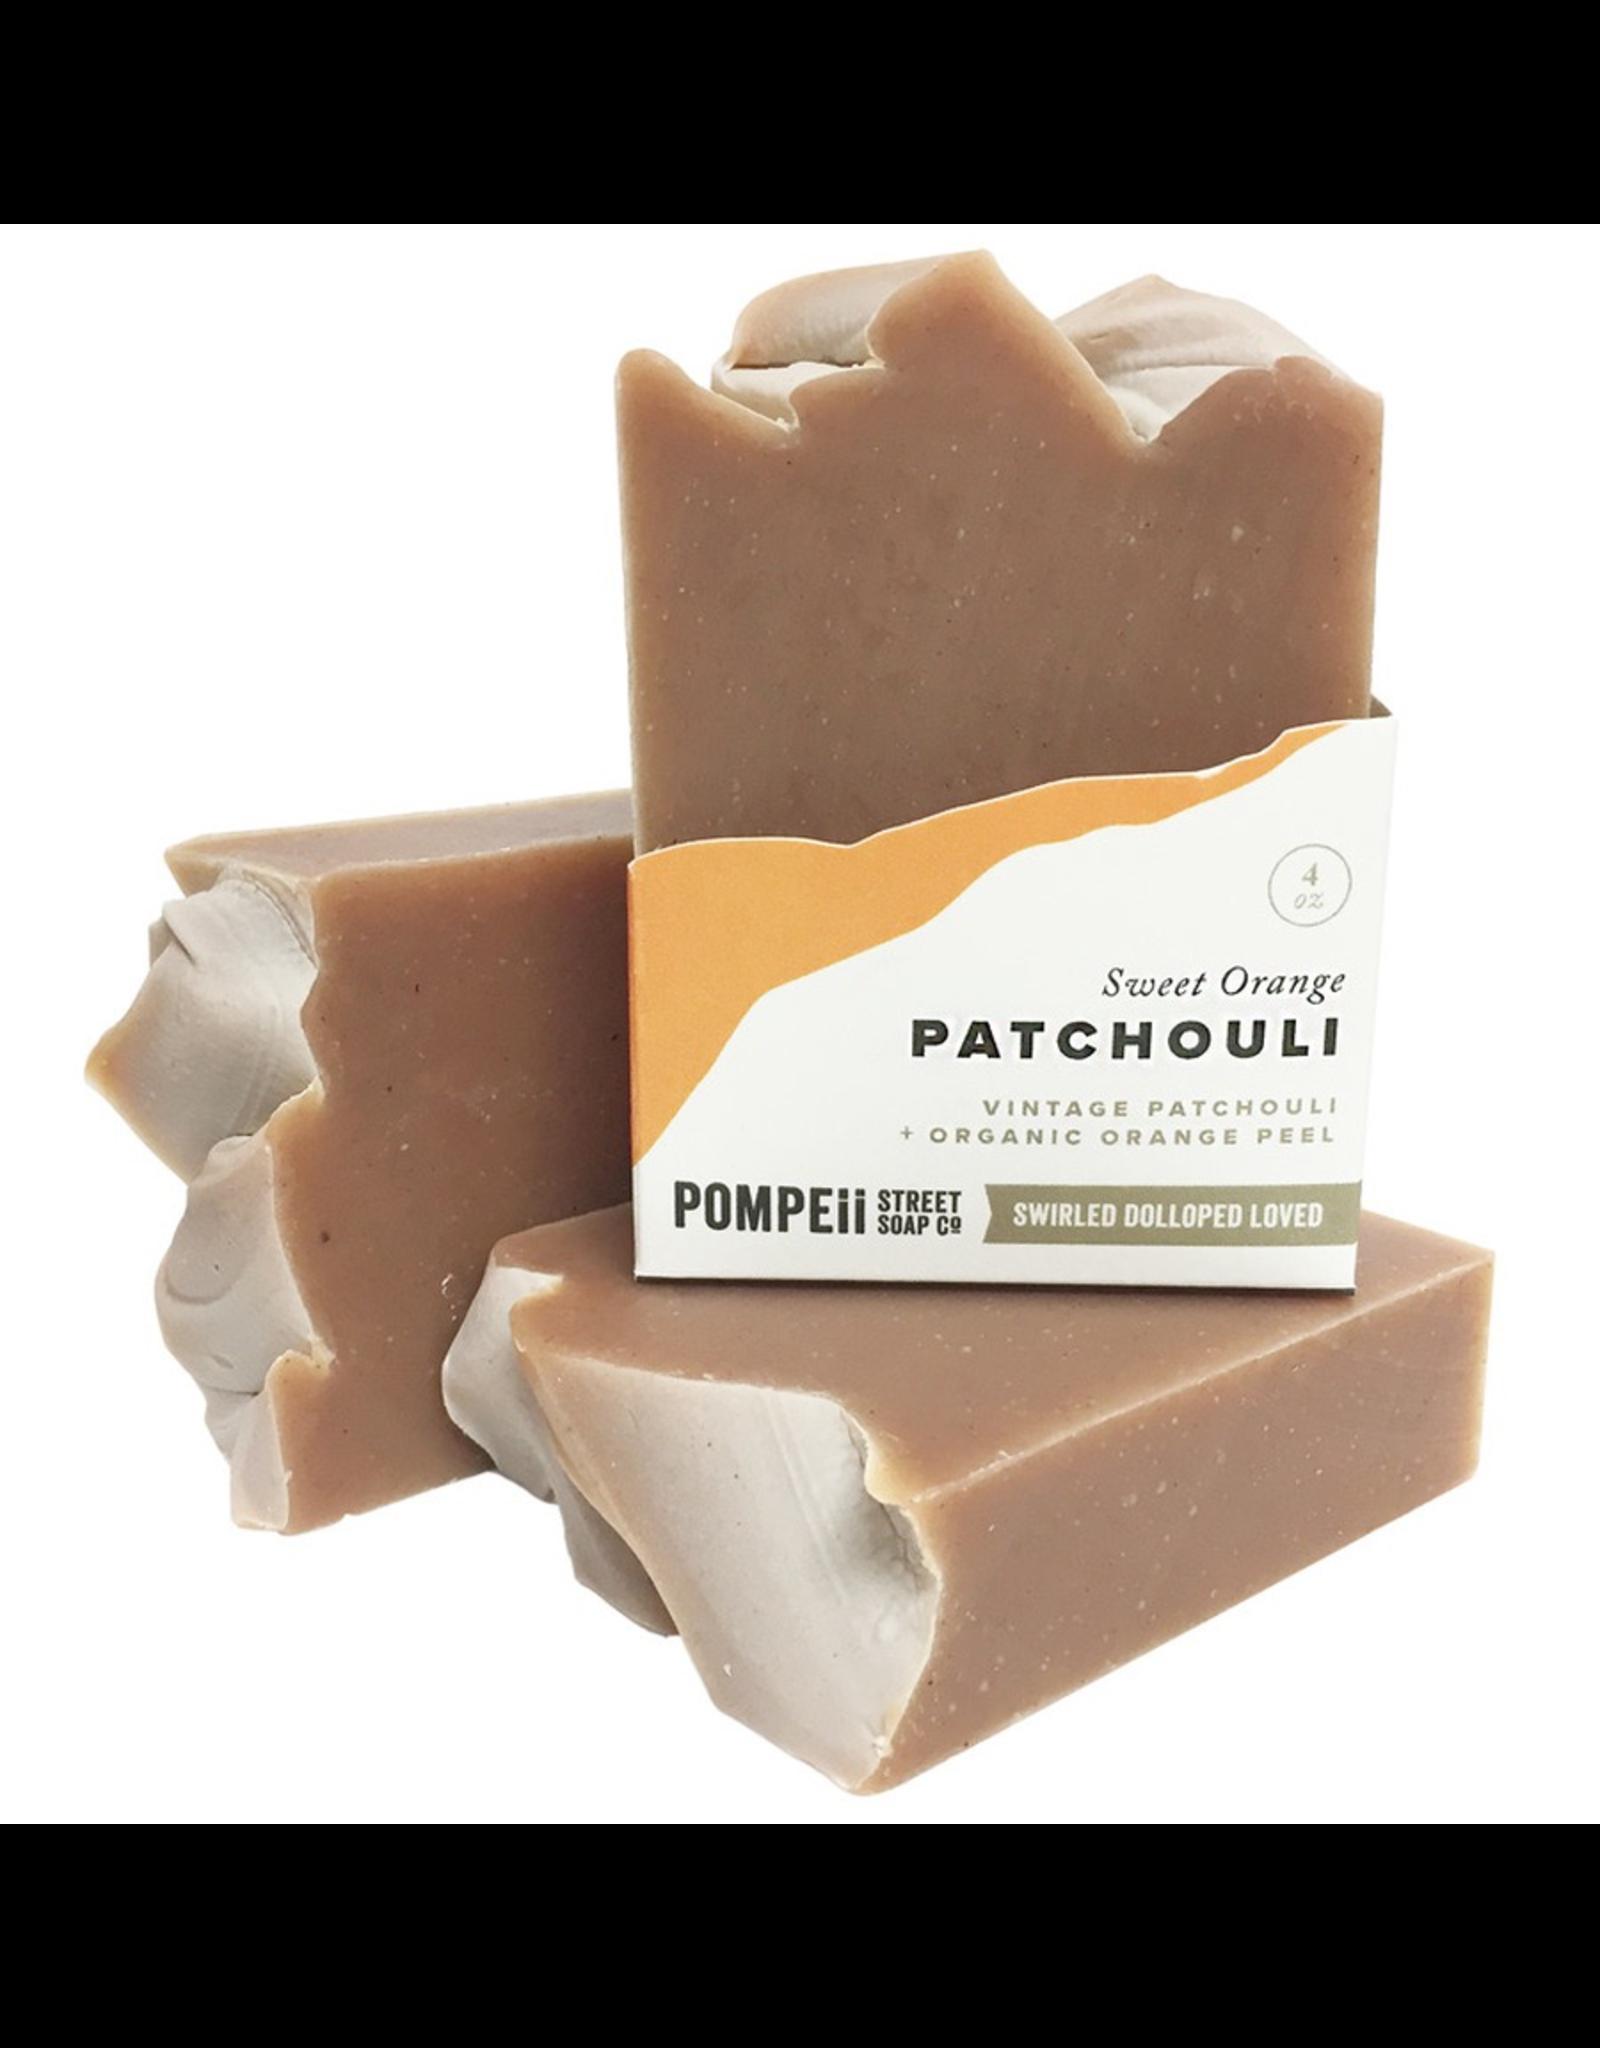 Pompeii Orange & Patchouli Soap 4 oz.